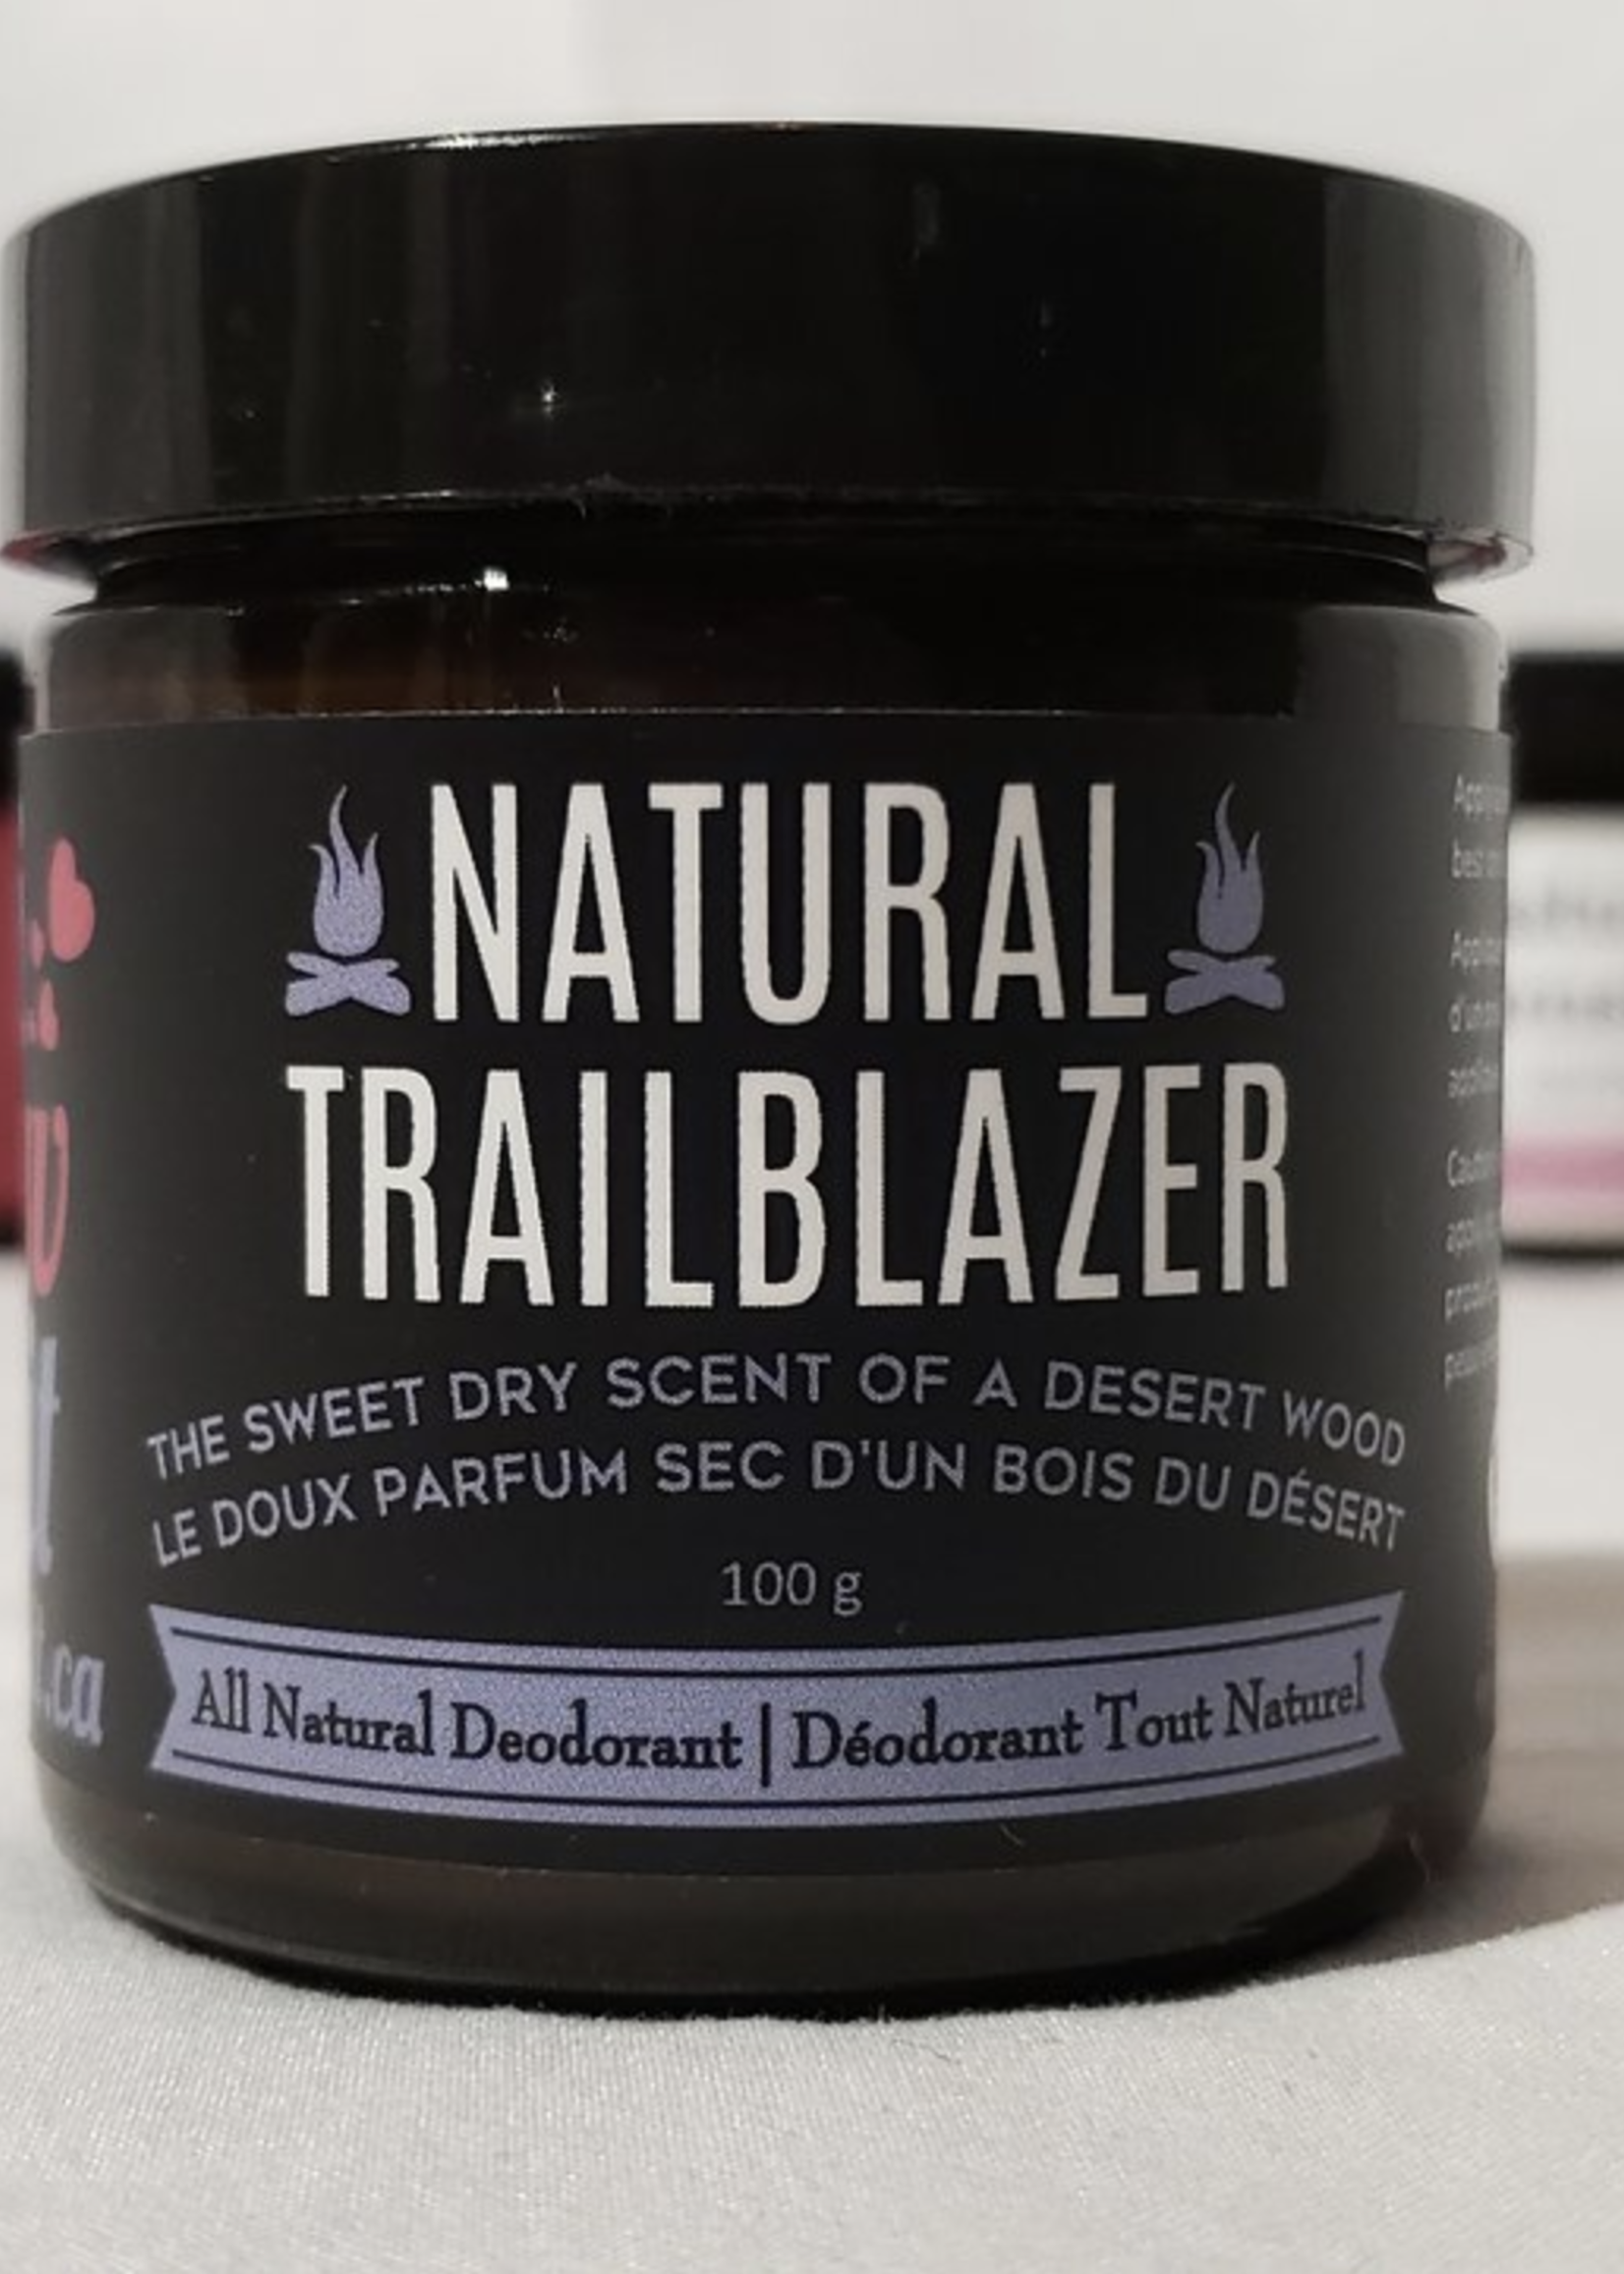 I Luv It Deodorant Natural Trailblazer Deodorant